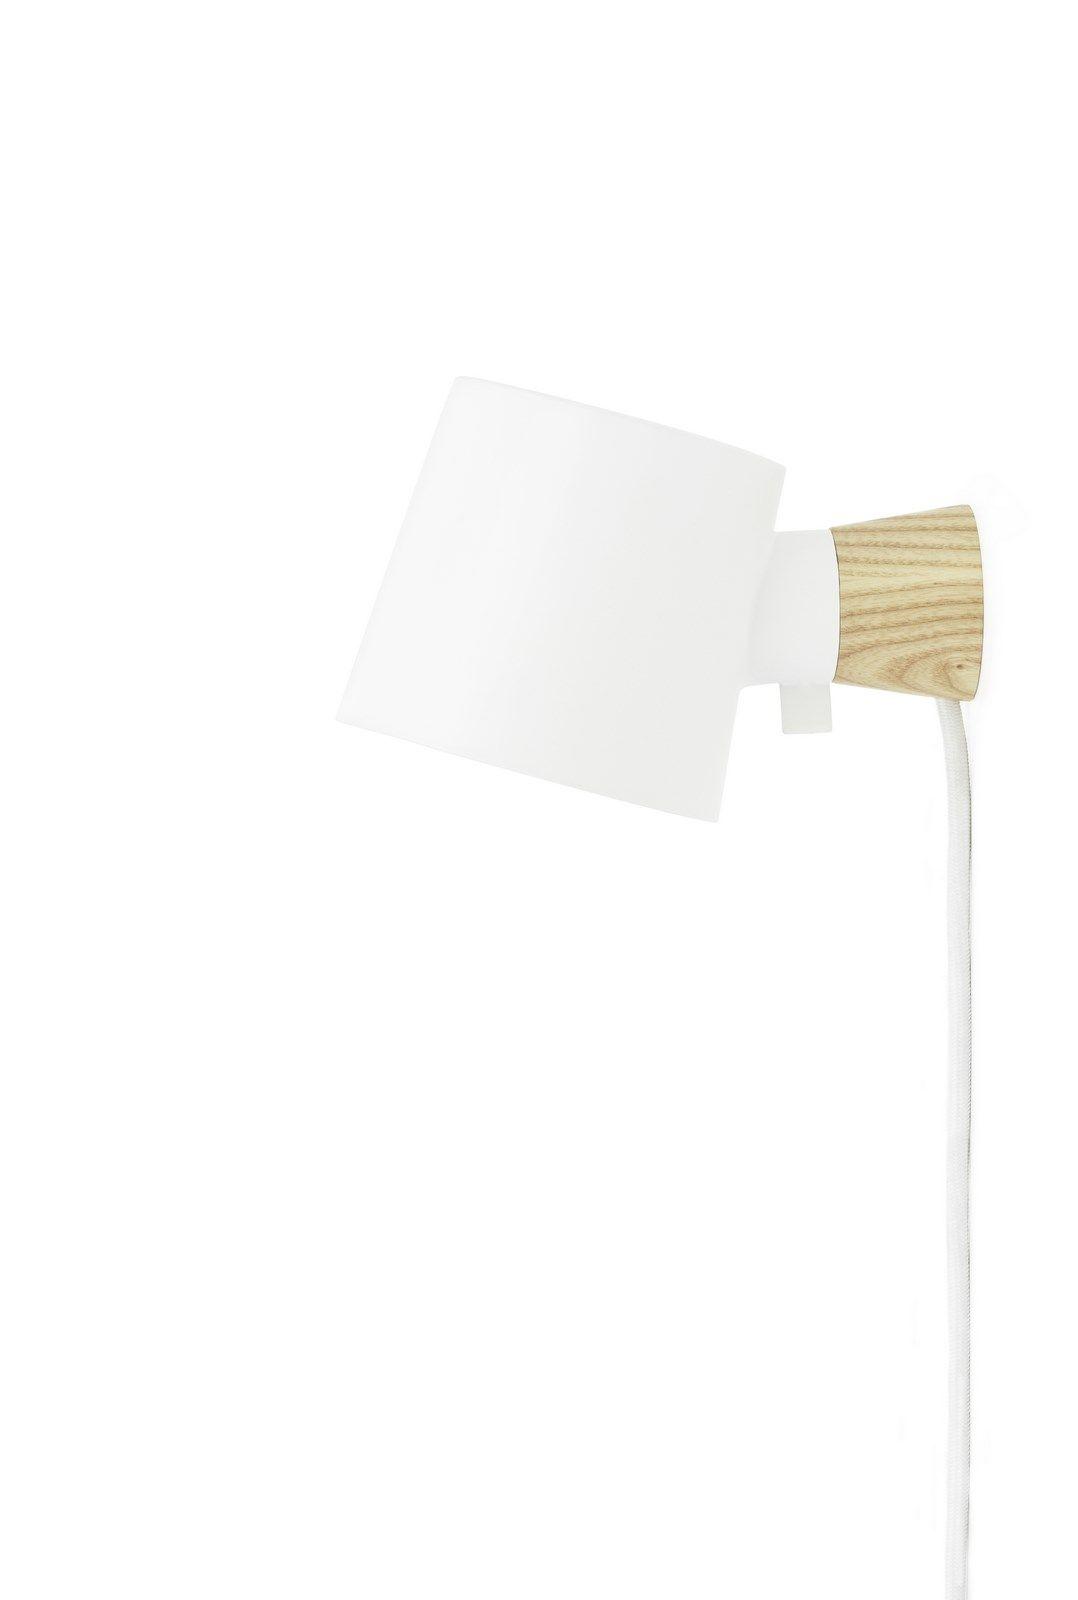 Normann Rise væglampe, 9,7 cm